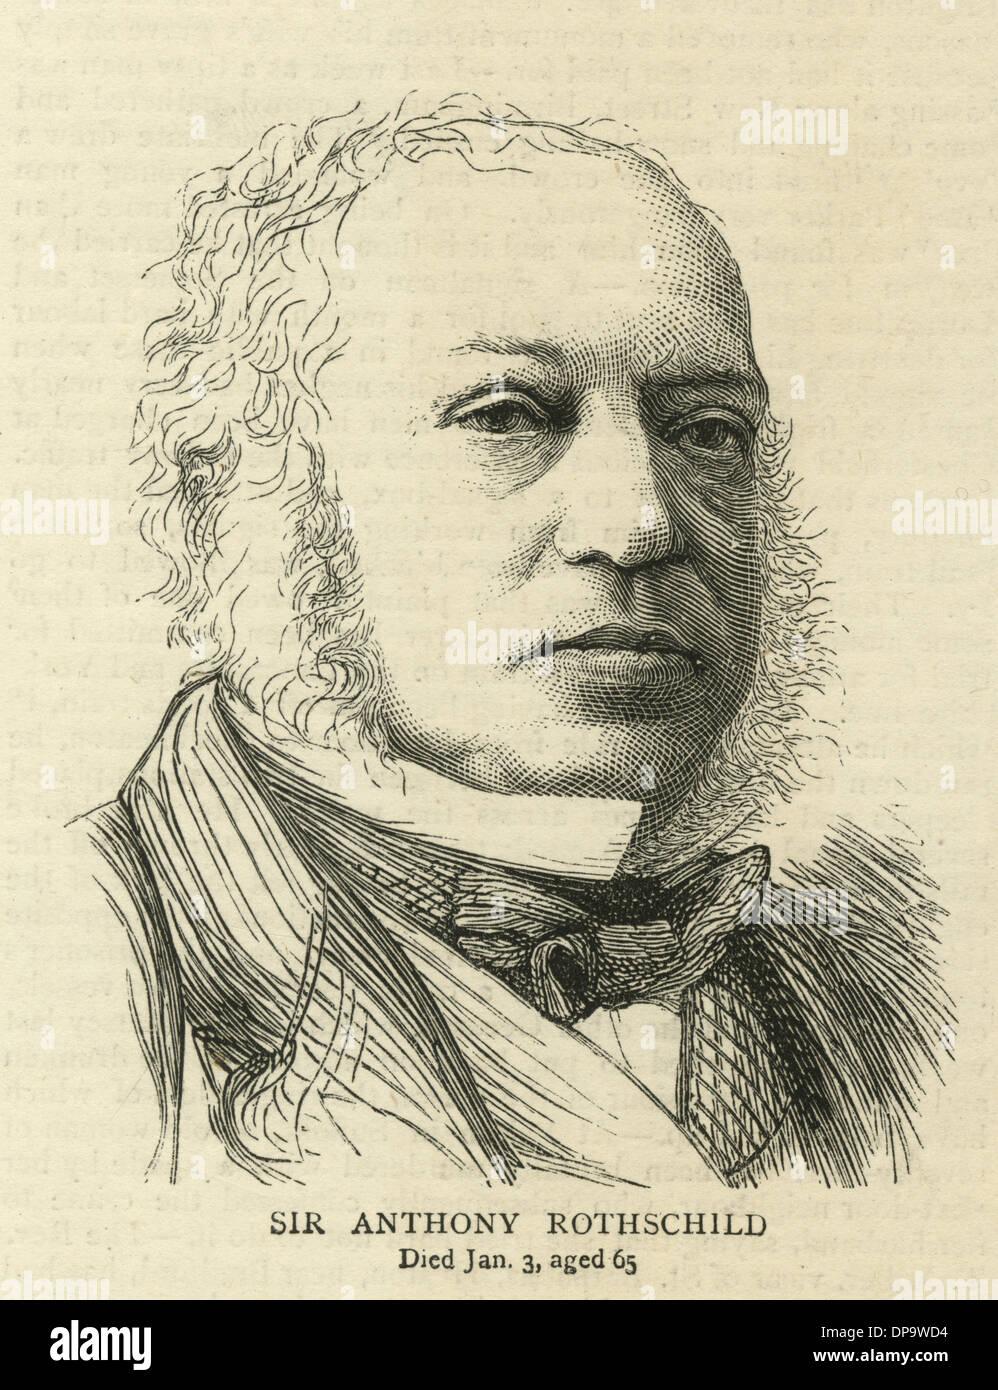 SIR ANTHONY ROTHSCHILD - Stock Image